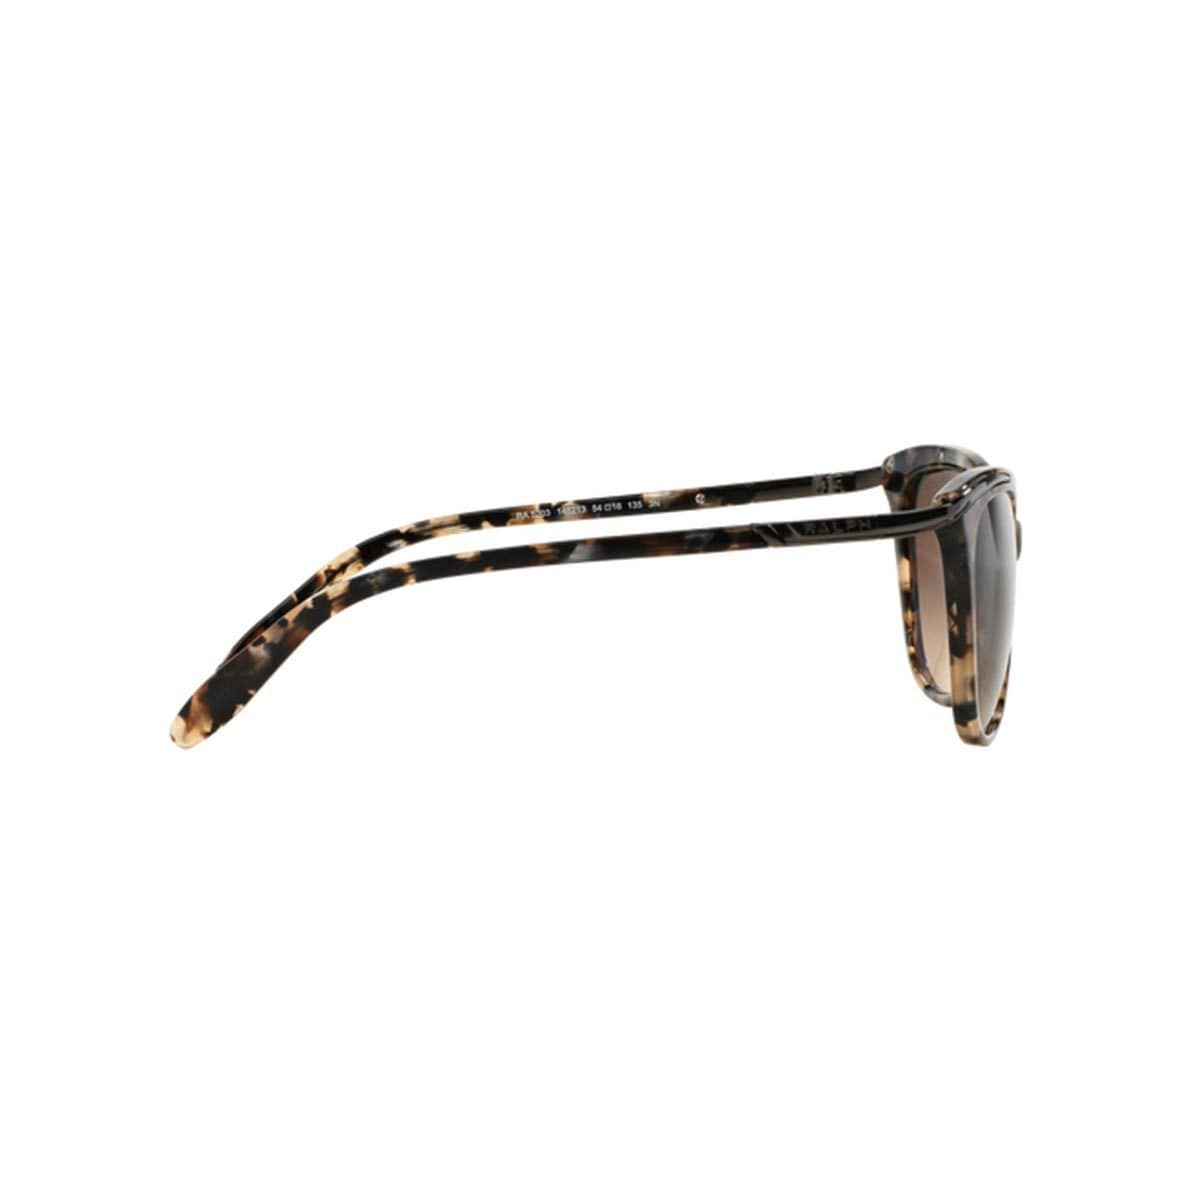 81850c059210 Shop Ralph by Ralph Lauren Women s RA5203 Brown Plastic Cat Eye Sunglasses  - Free Shipping Today - Overstock.com - 10857345